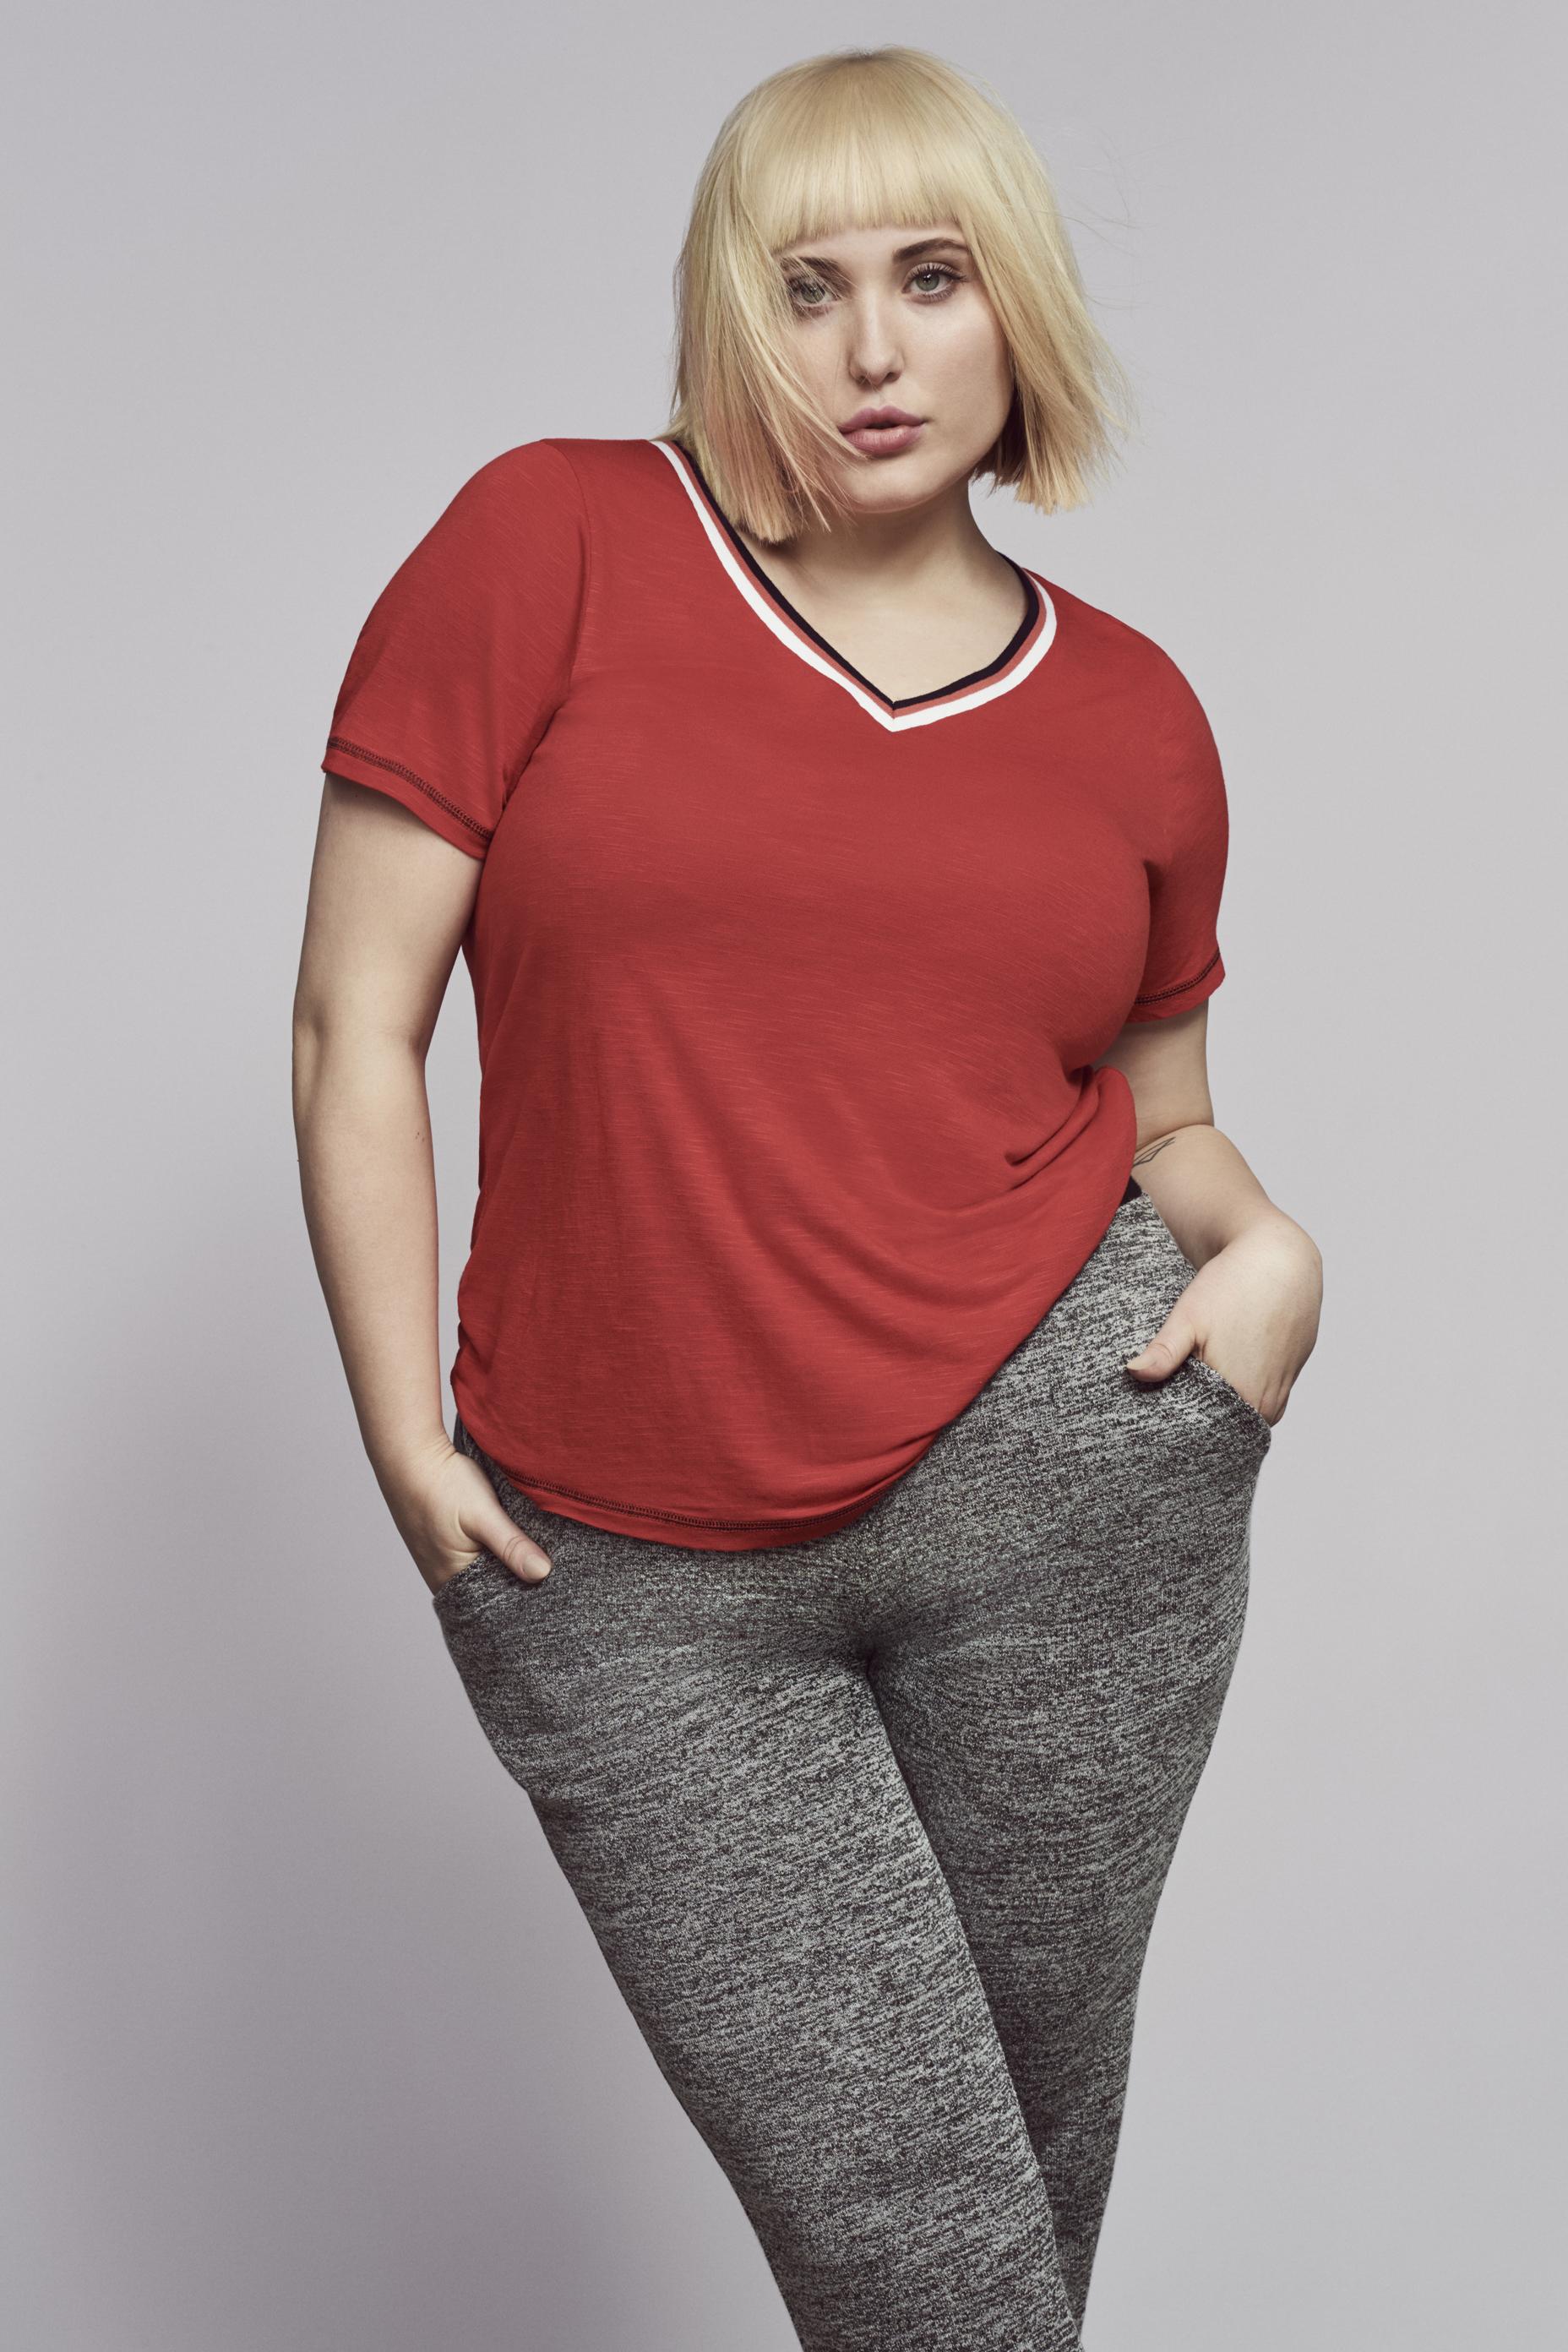 Evans New Activewear Collection Features Hayley Hasselhoff ...